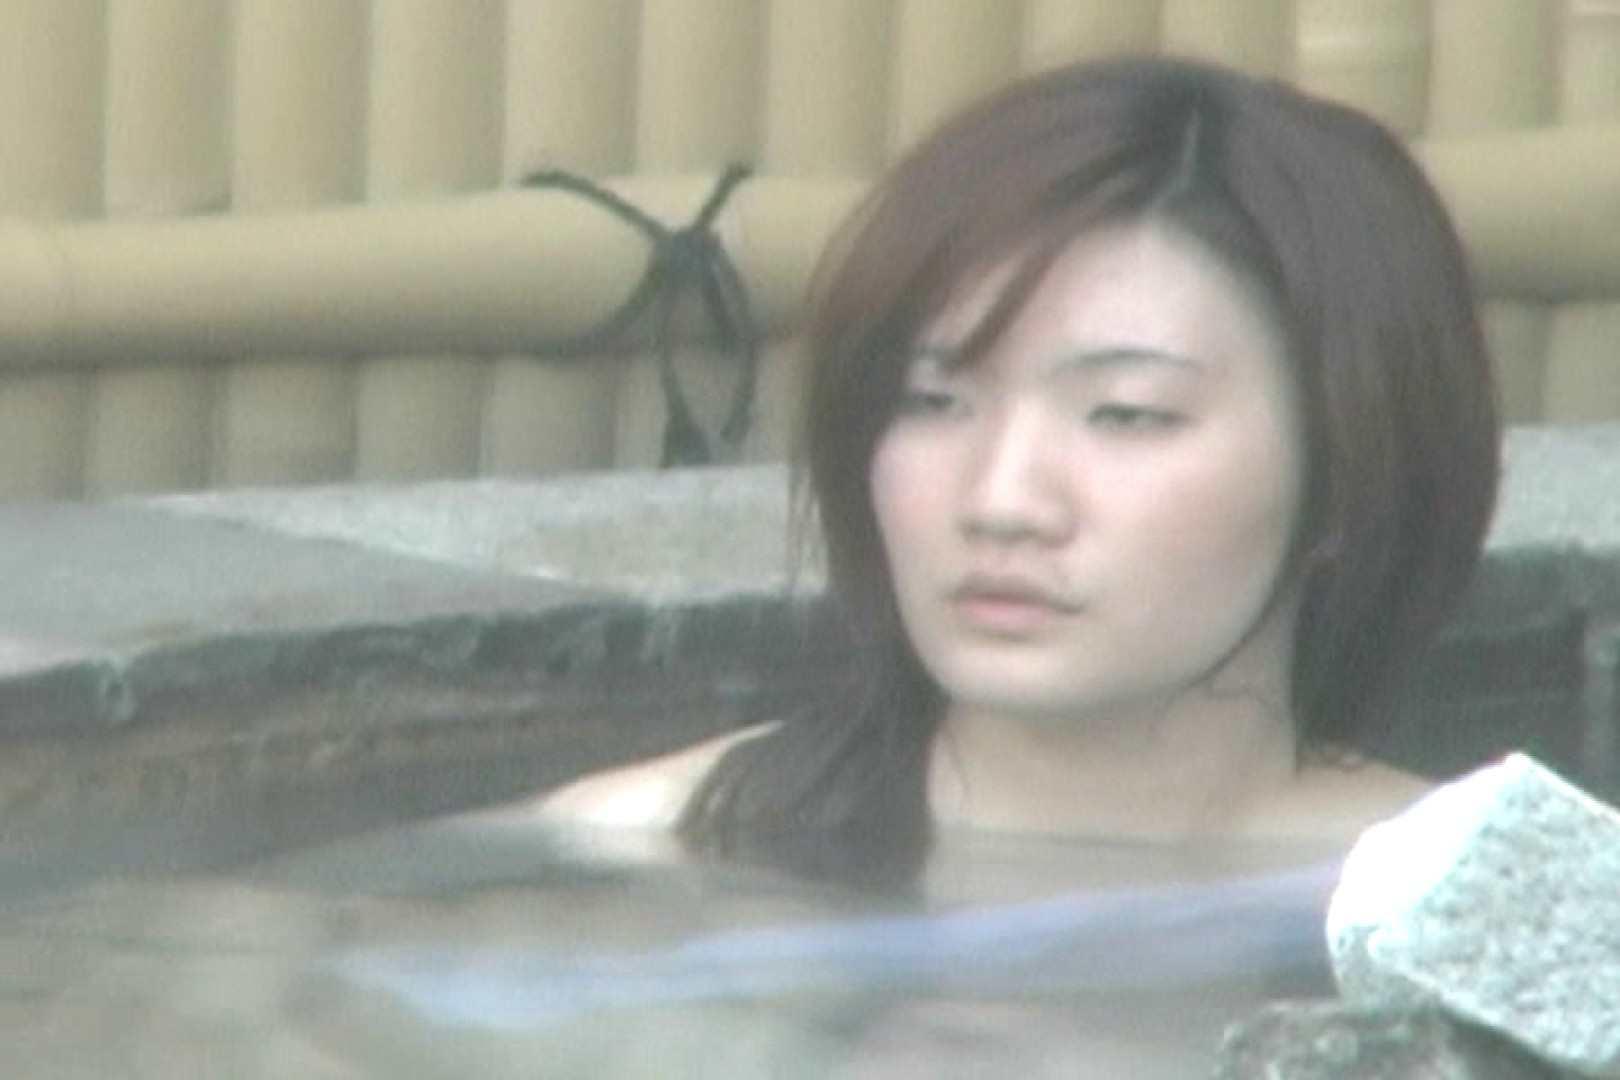 Aquaな露天風呂Vol.590 露天 われめAV動画紹介 50PICs 29